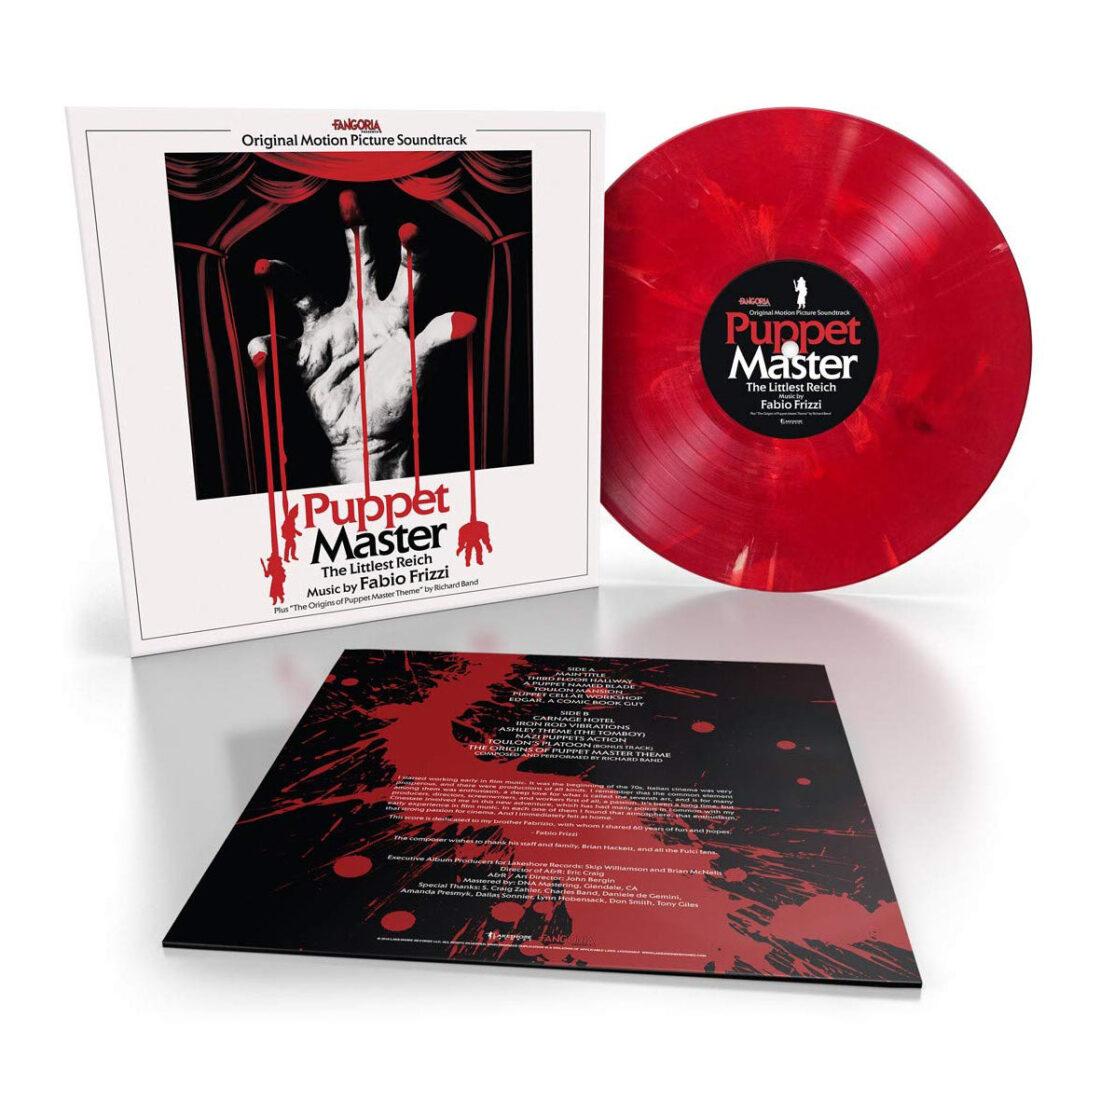 Puppet Master: The Littlest Reich Toulon's Bloody Revenge Vinyl Edition